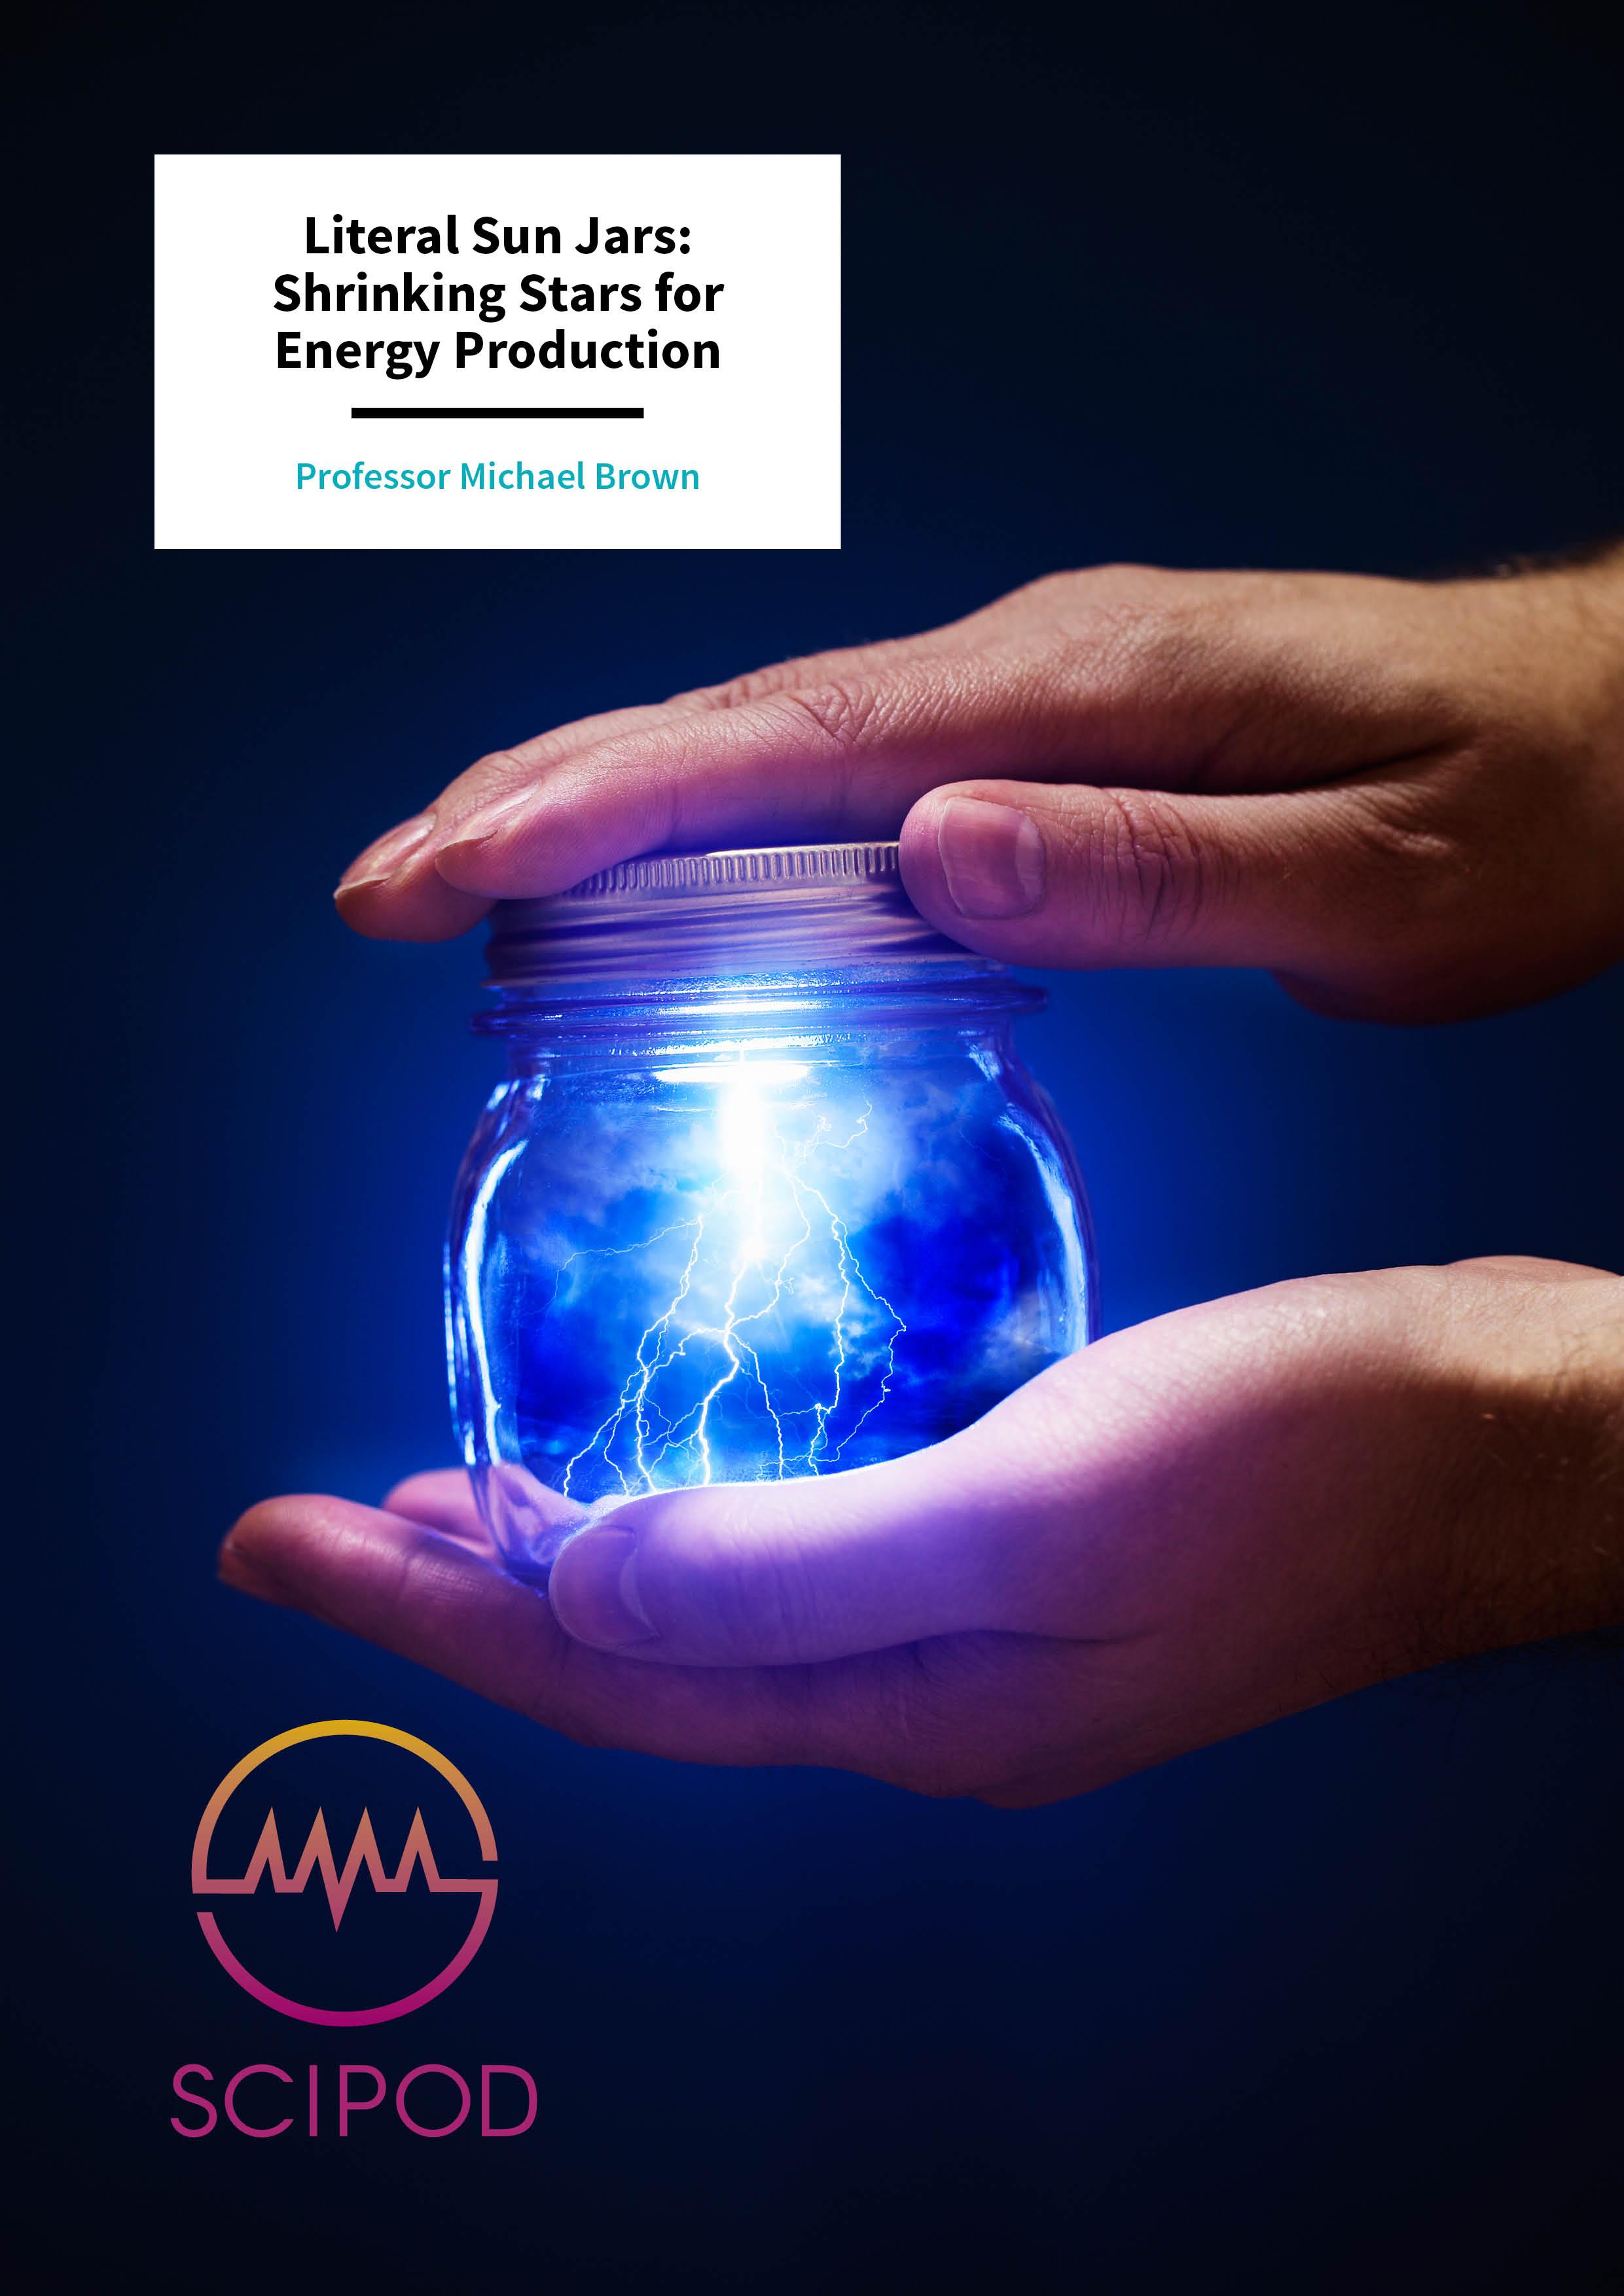 Literal Sun Jars Shrinking Stars for Energy Production – Professor Michael Brown, Swarthmore College